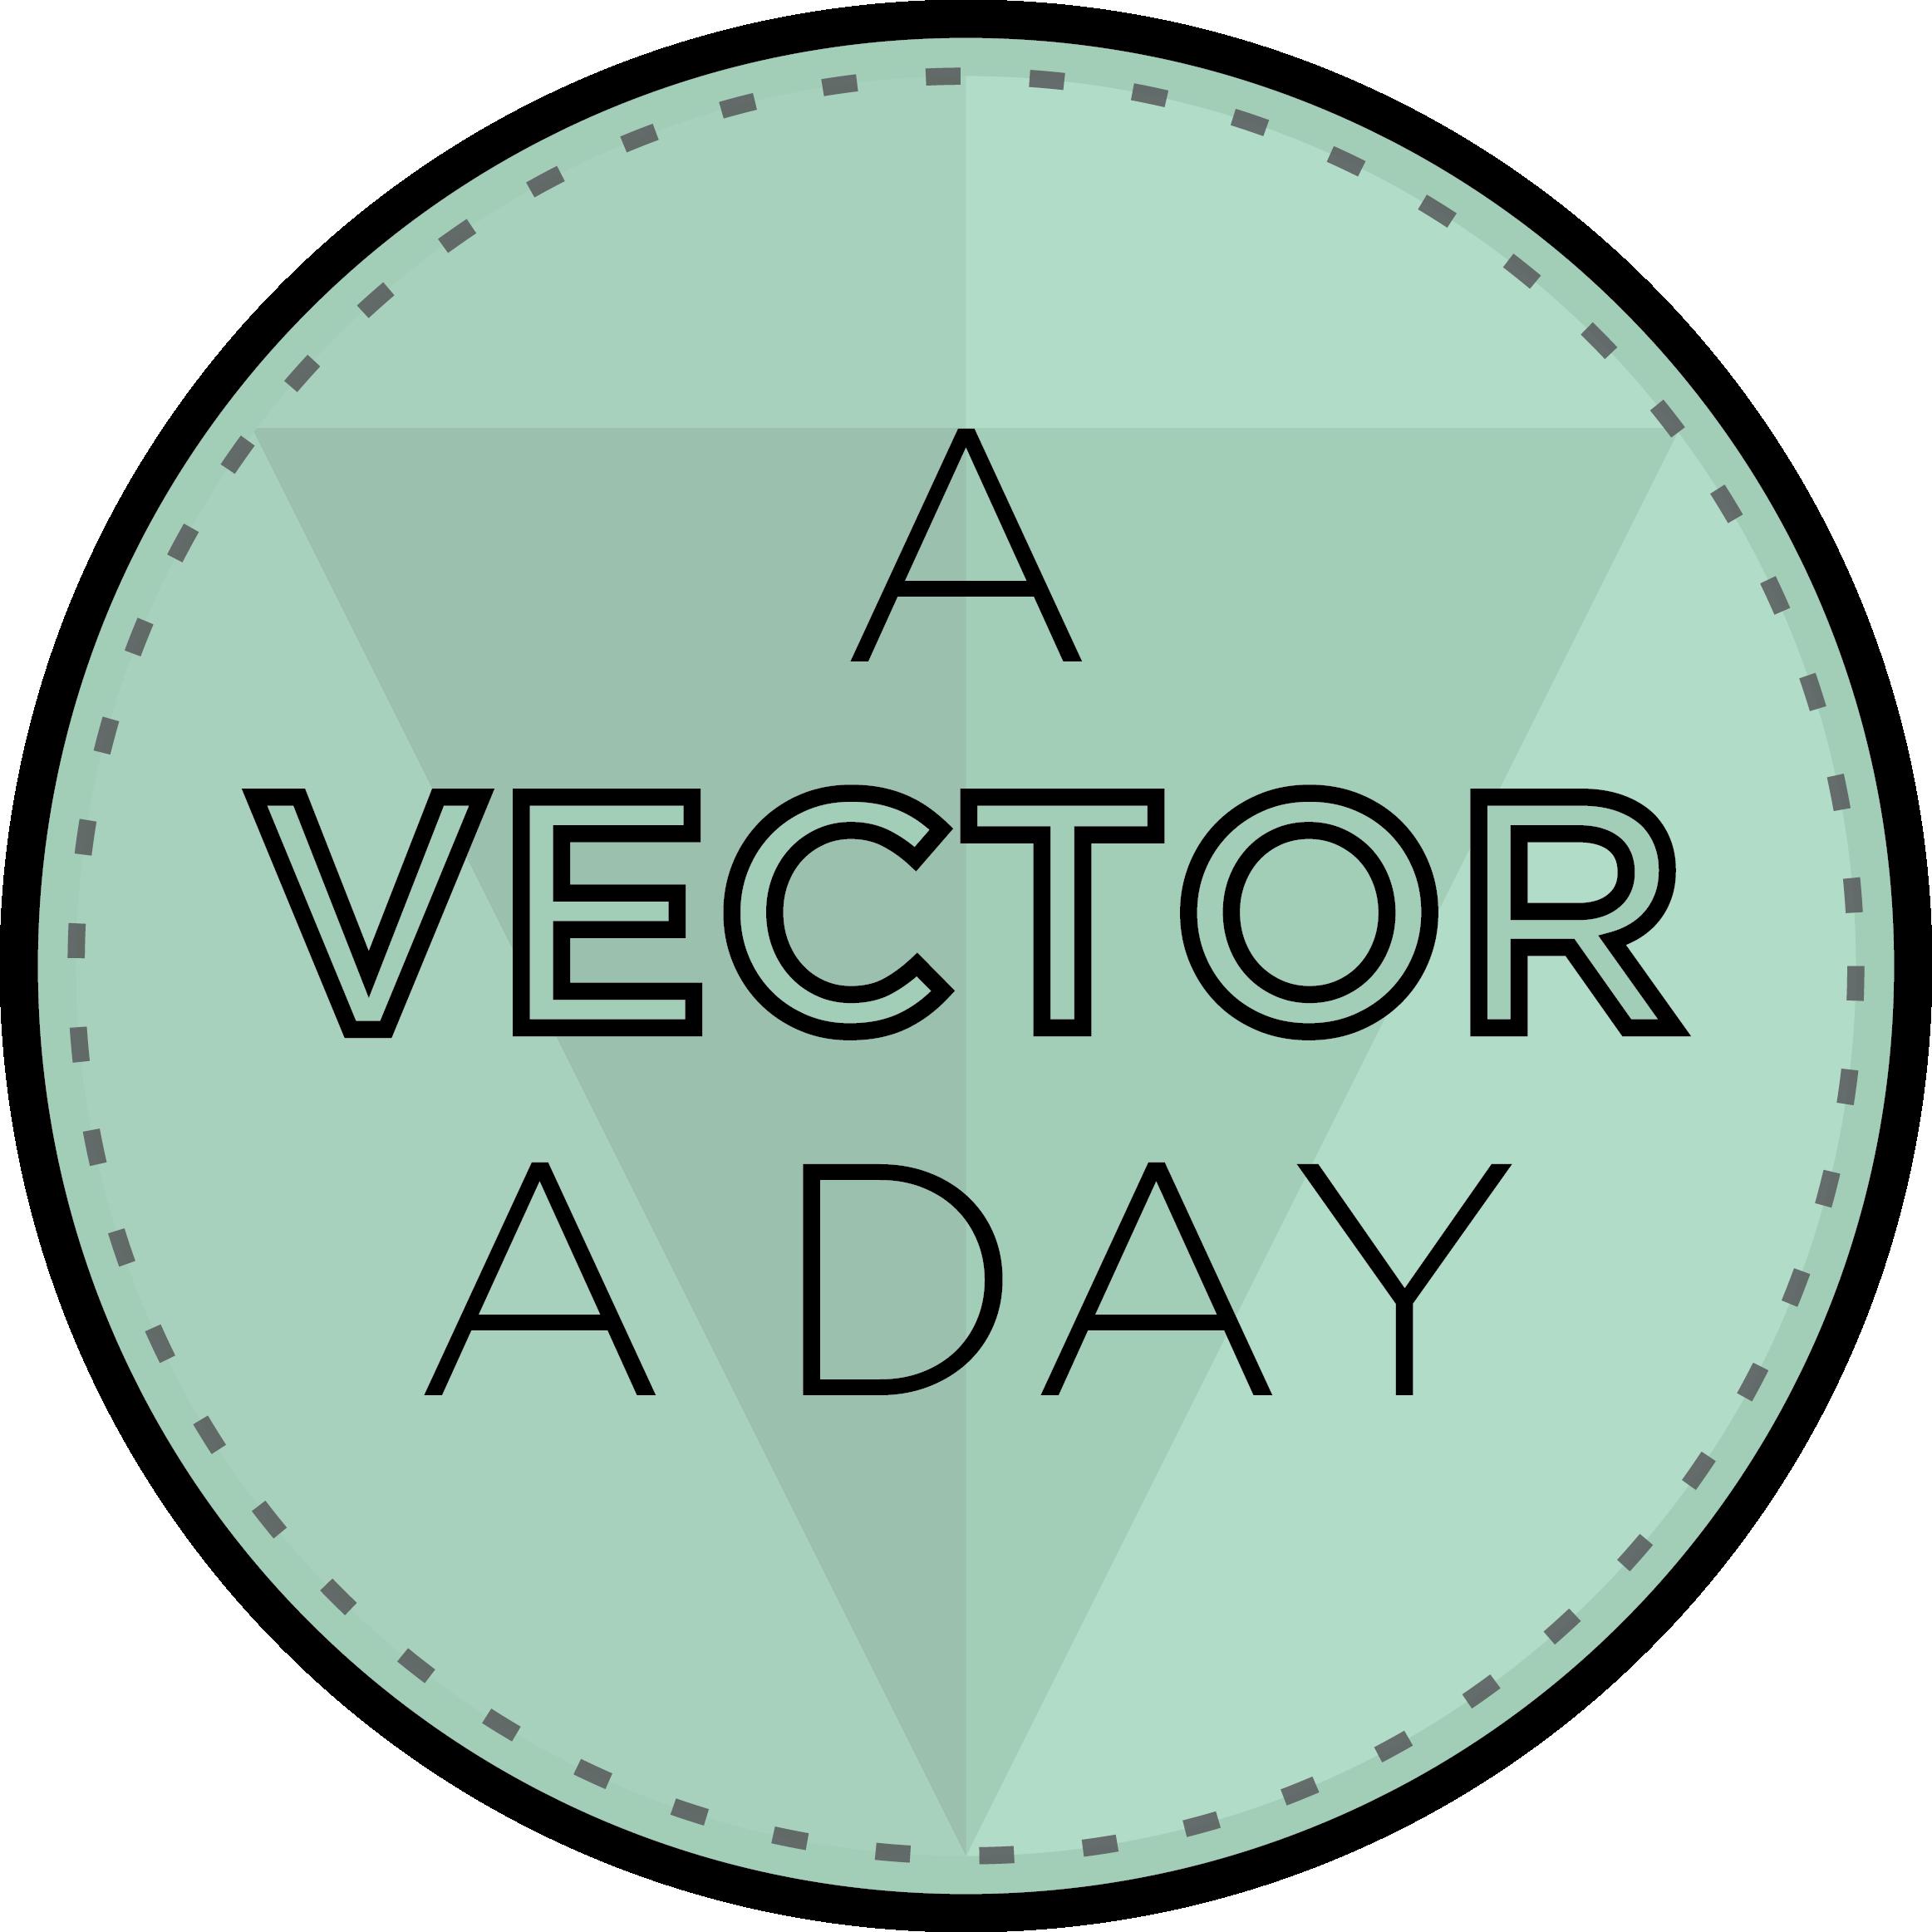 A Vector A Day